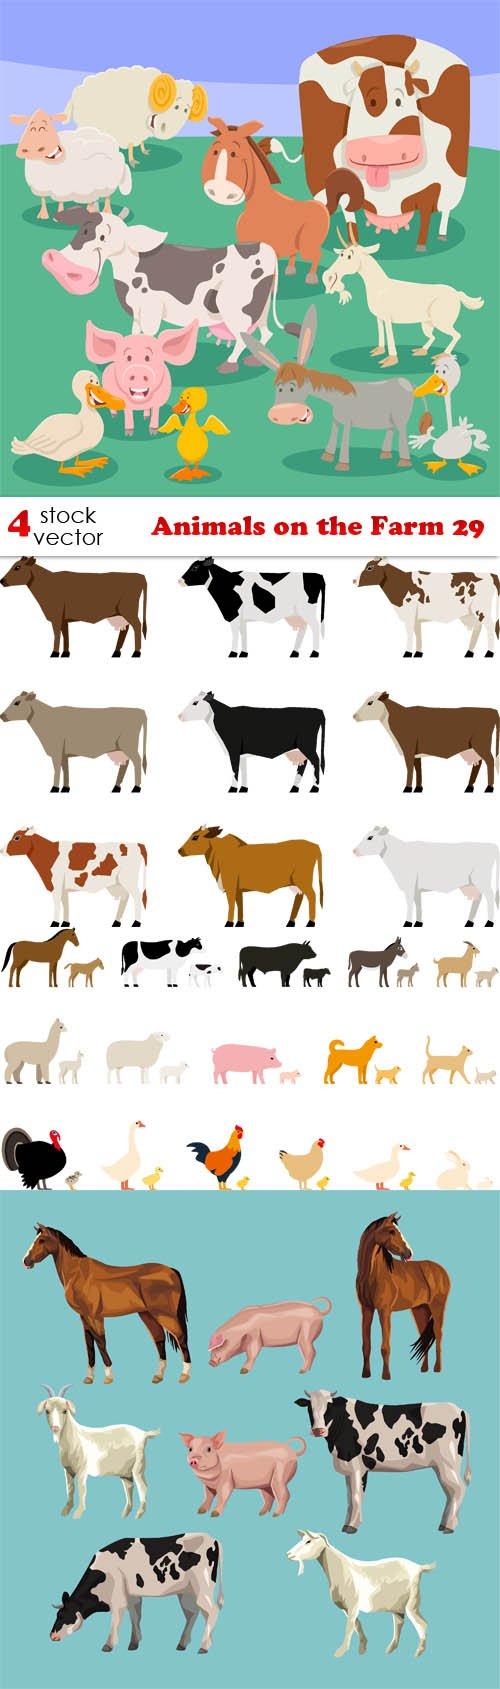 Vectors - Animals on the Farm 29